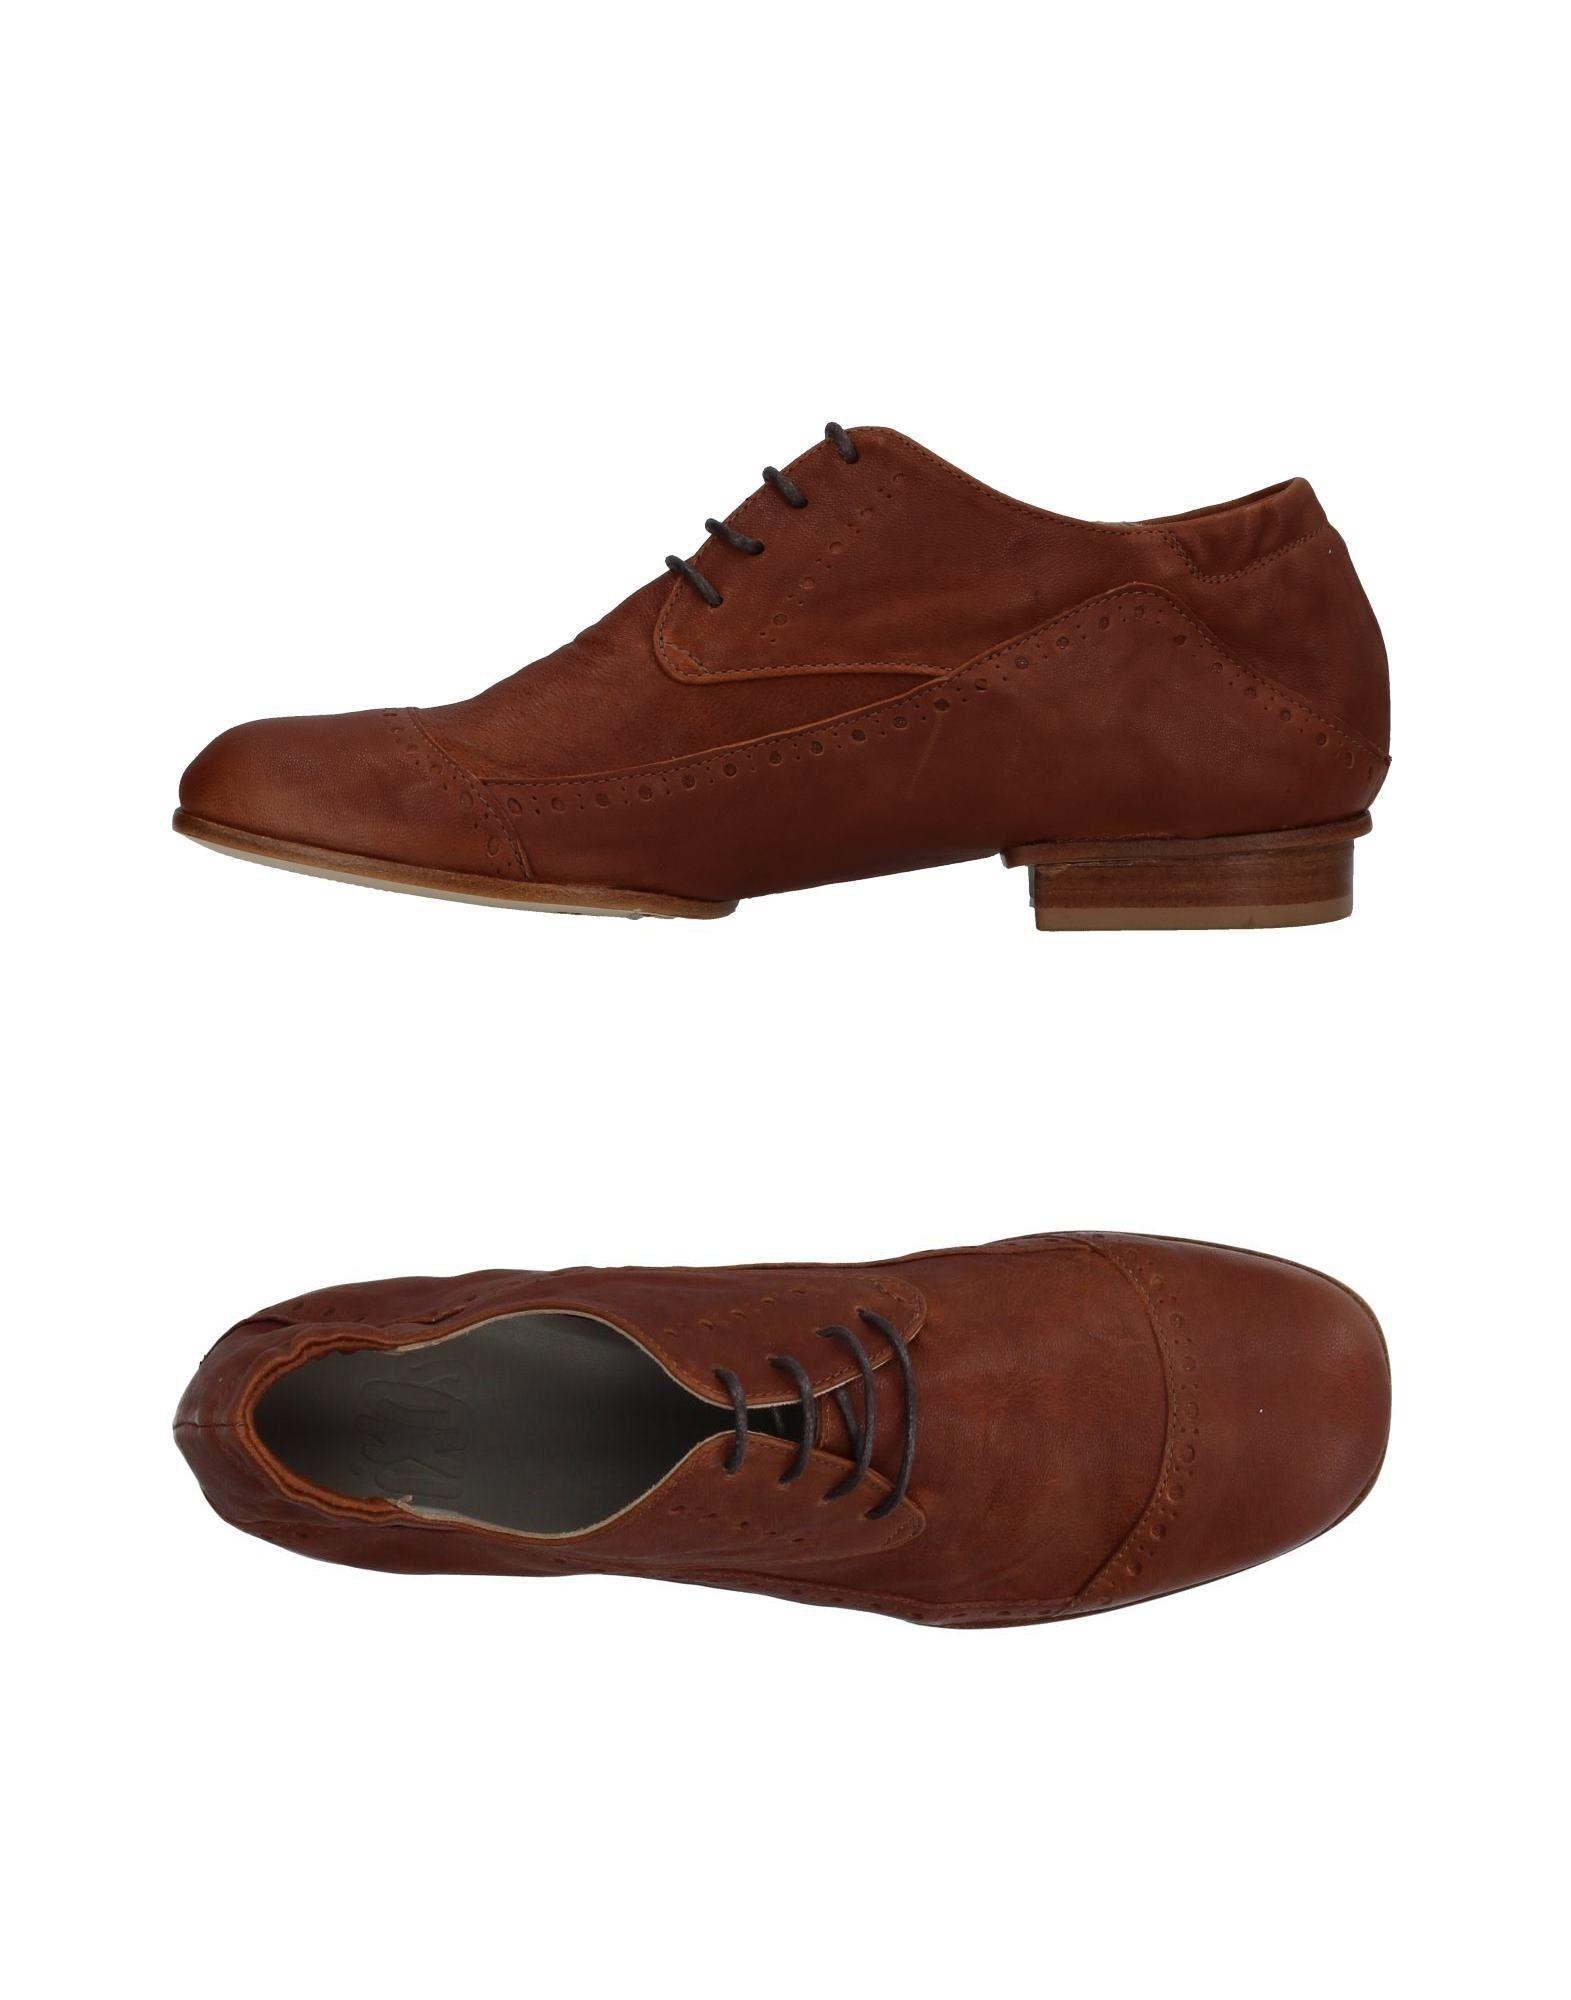 Ixos Schnürschuhe Damen  11384954RC Gute Qualität beliebte Schuhe